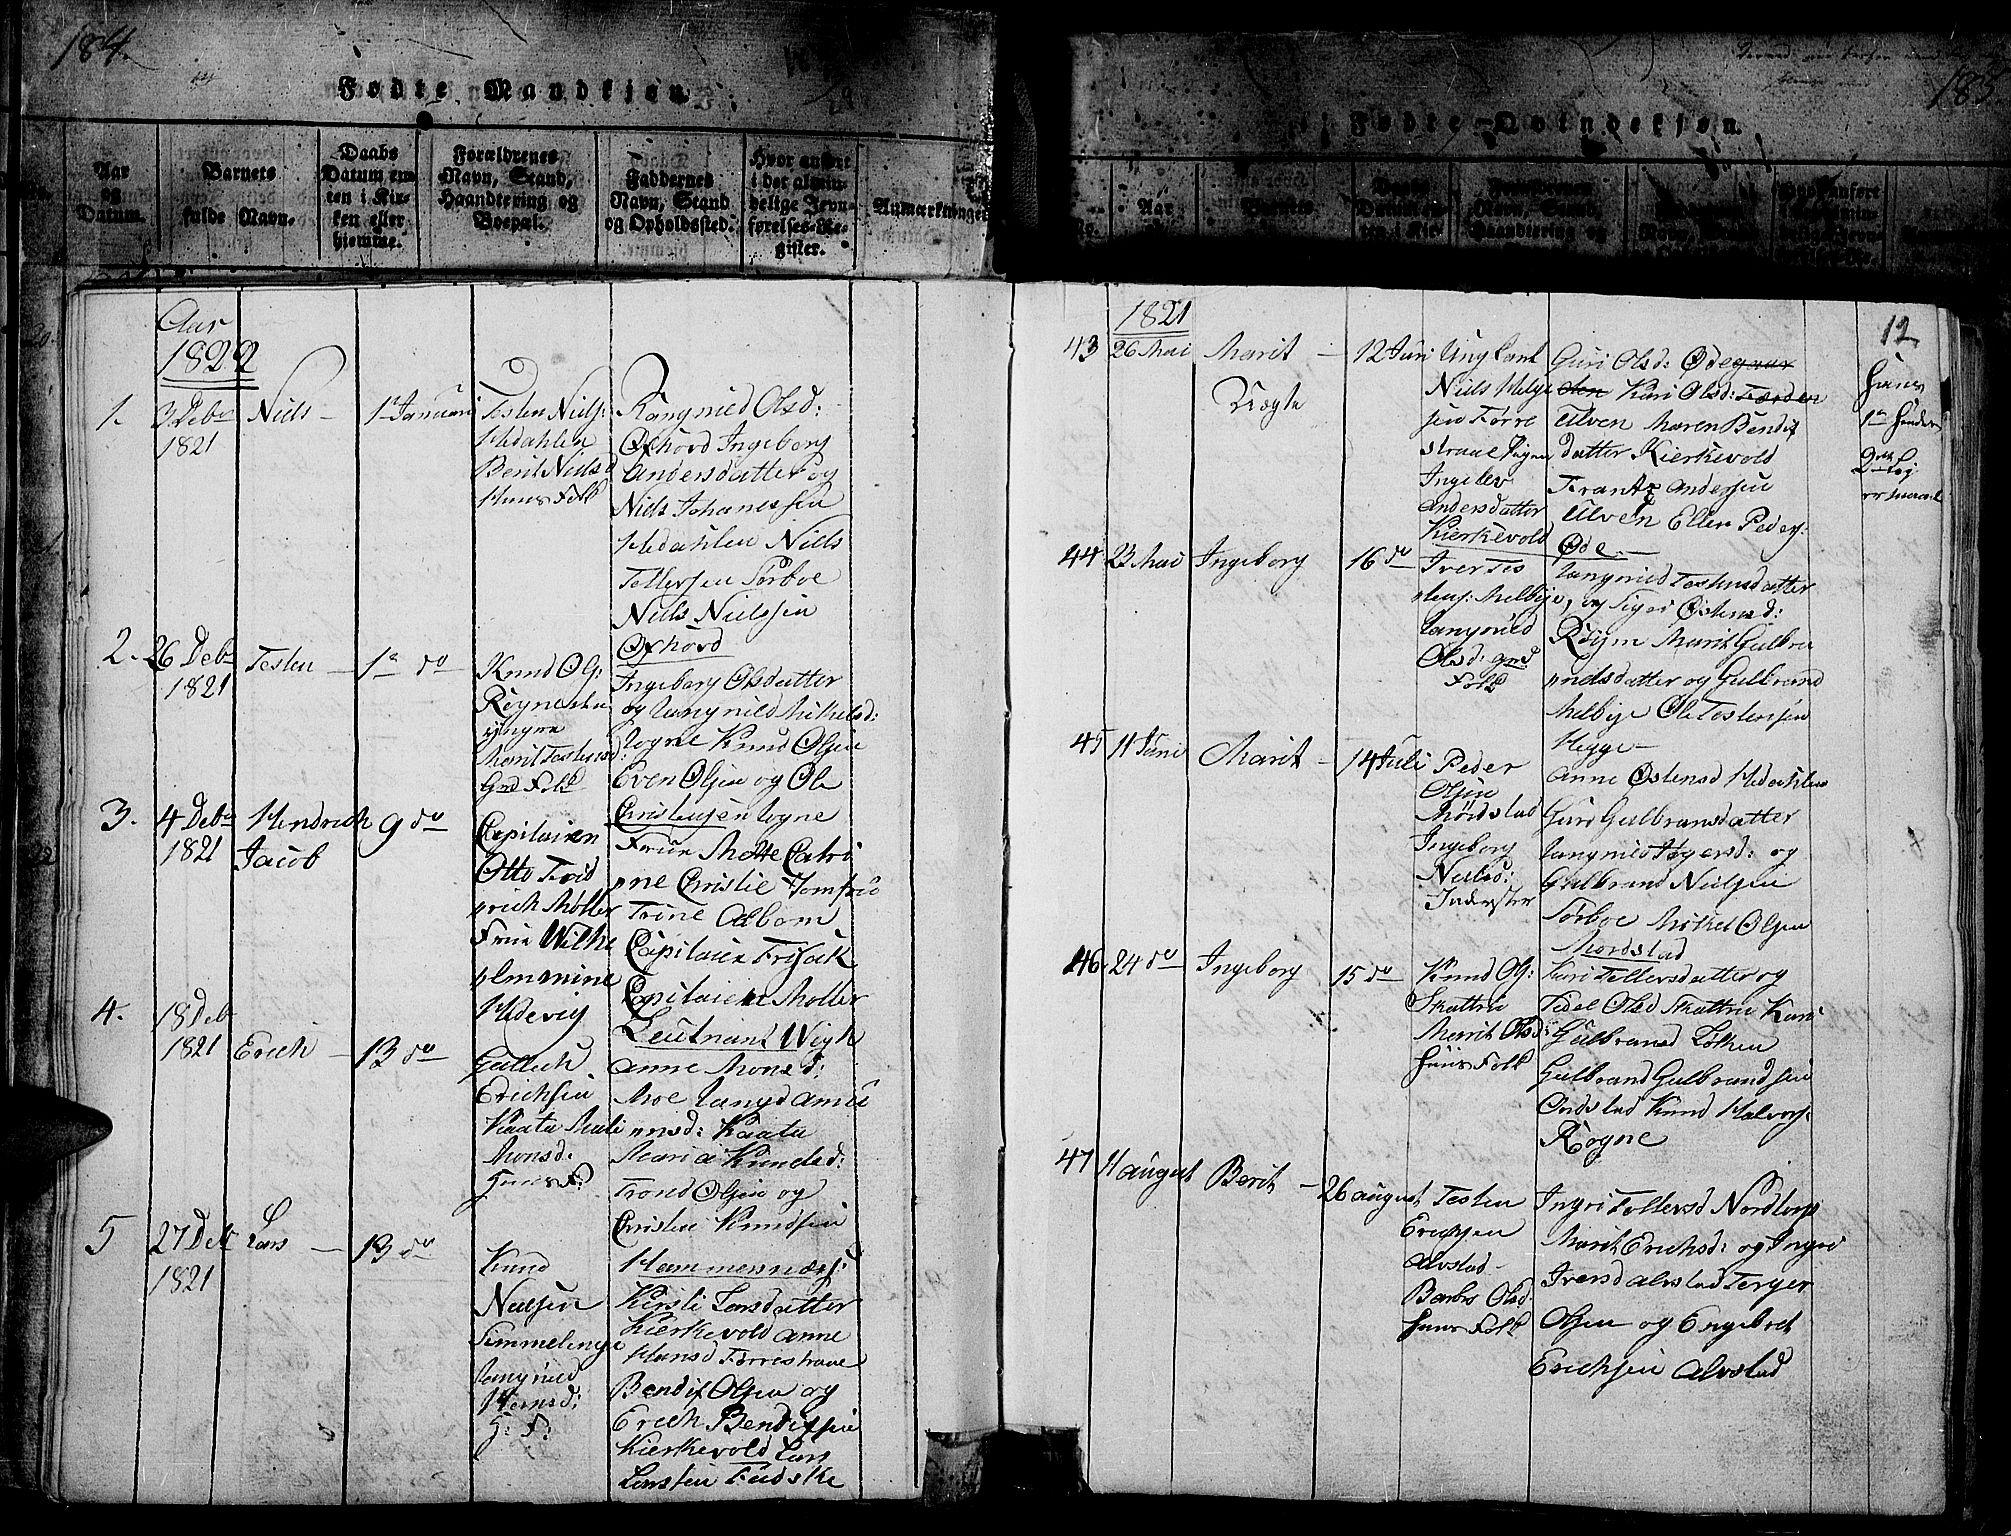 SAH, Slidre prestekontor, Ministerialbok nr. 2, 1814-1830, s. 184l